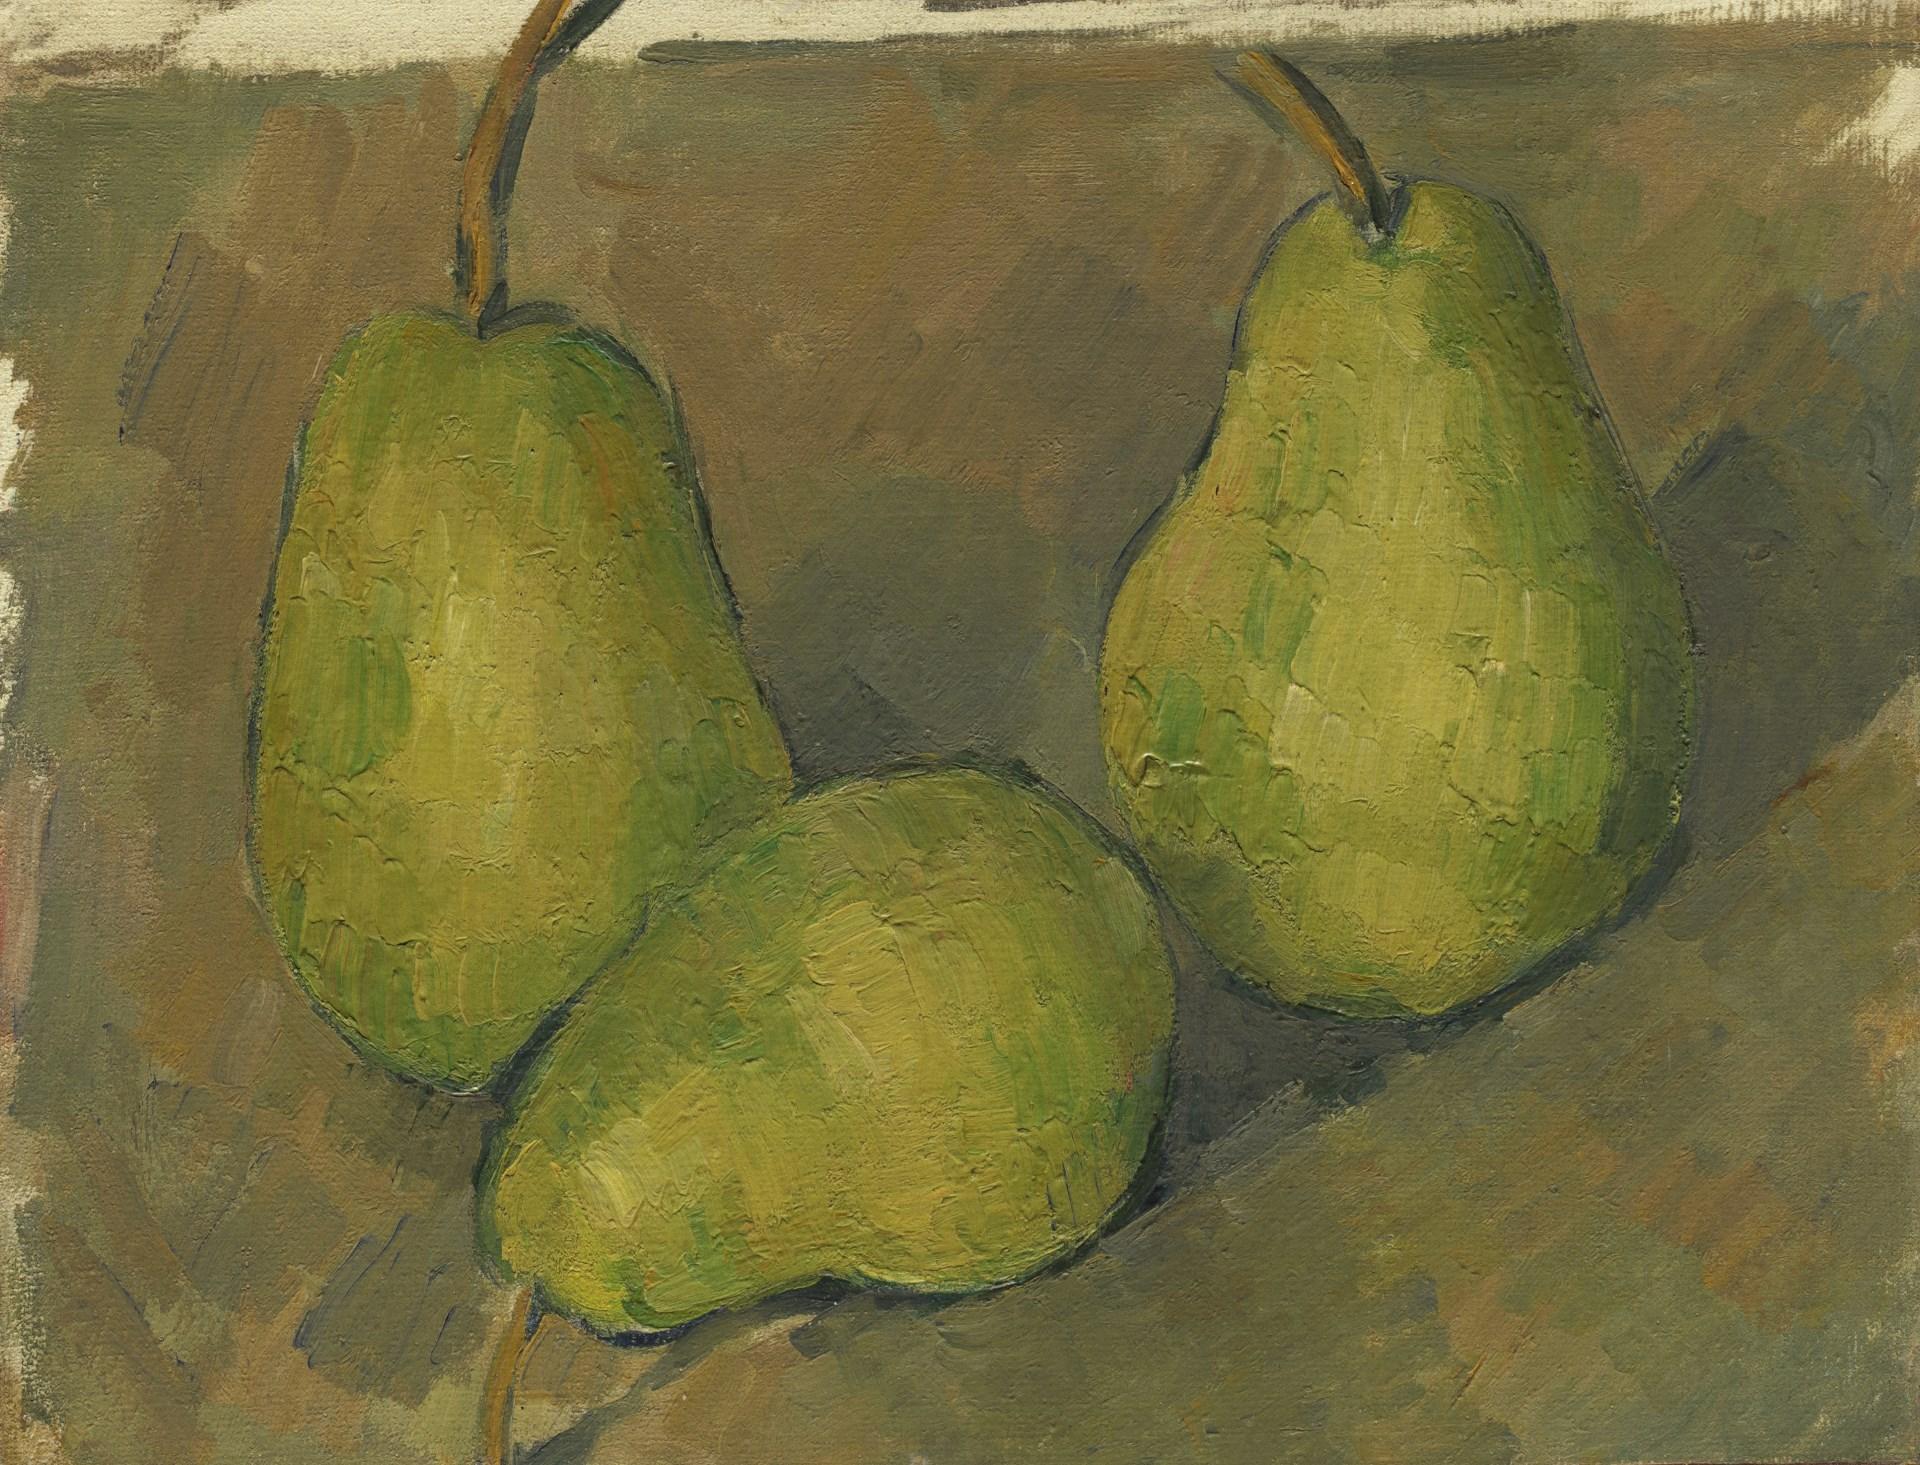 Three Pears, 1878/1879